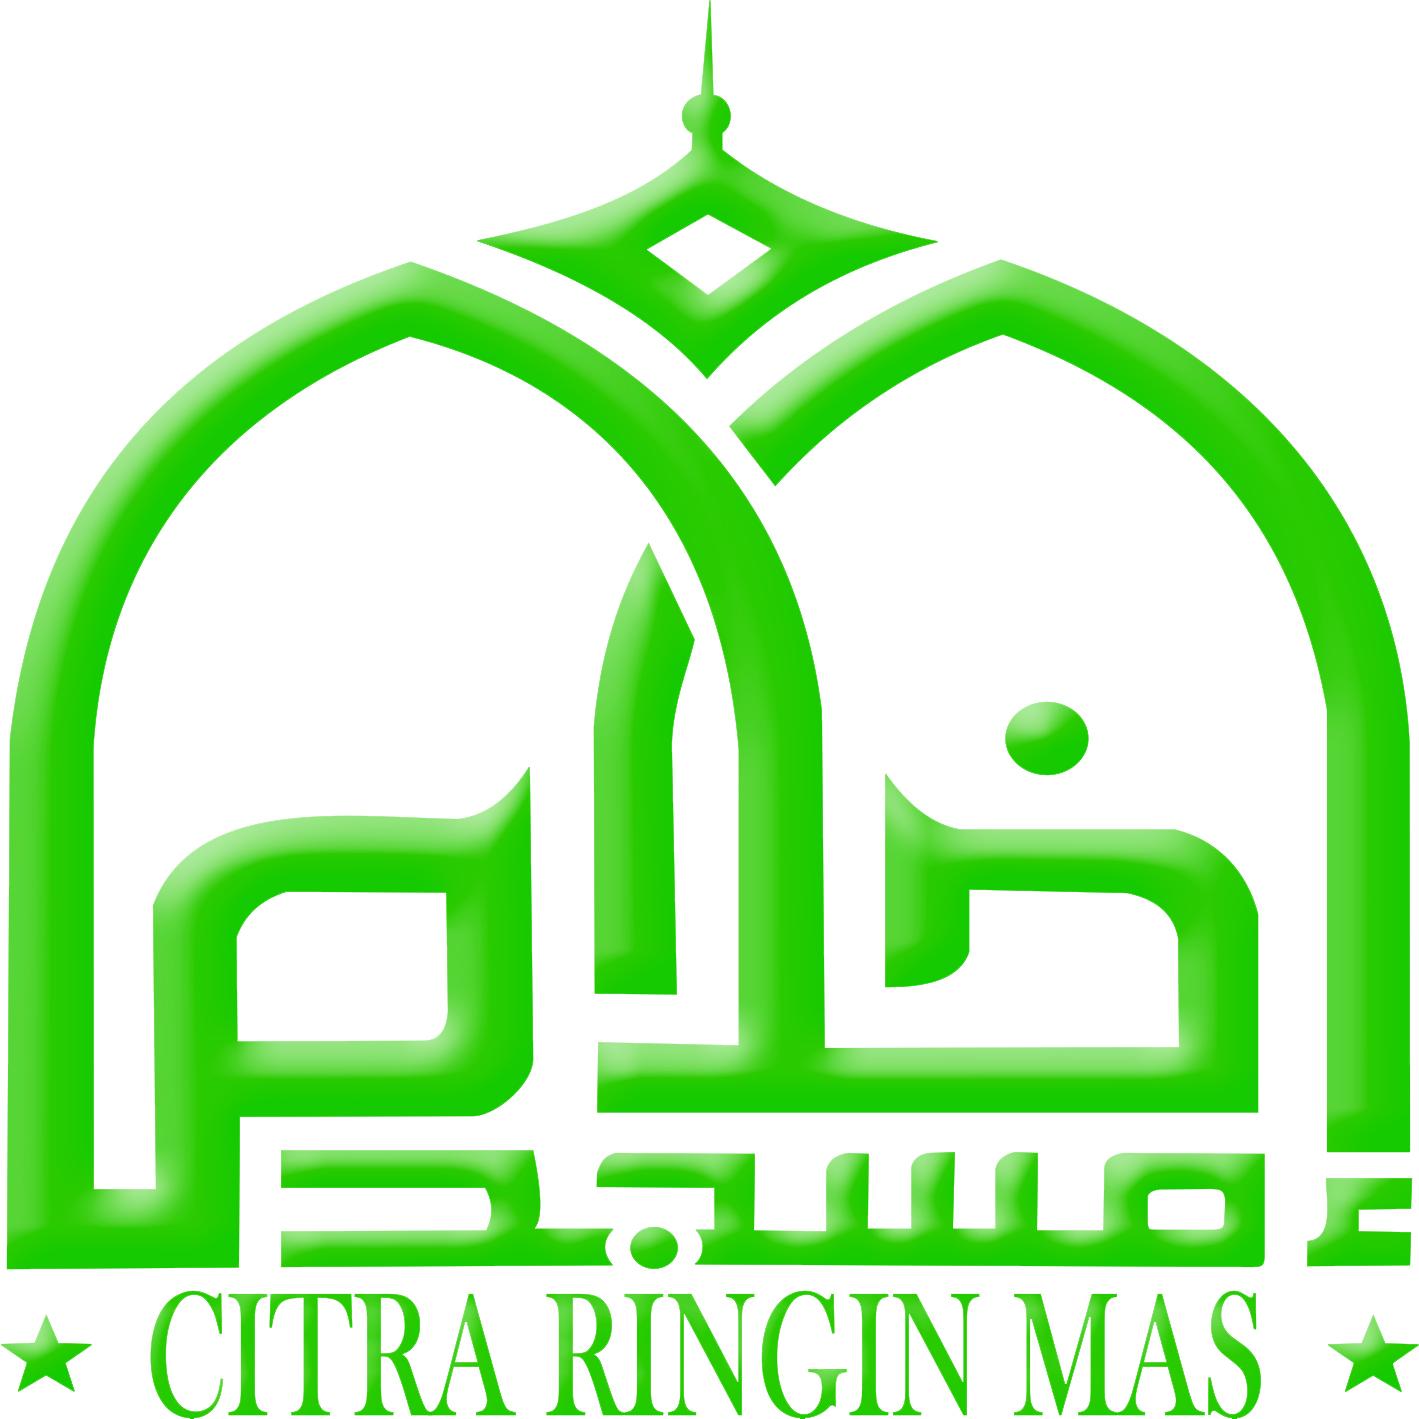 Masjid Al-Ikhlas Citra Ringin Mas